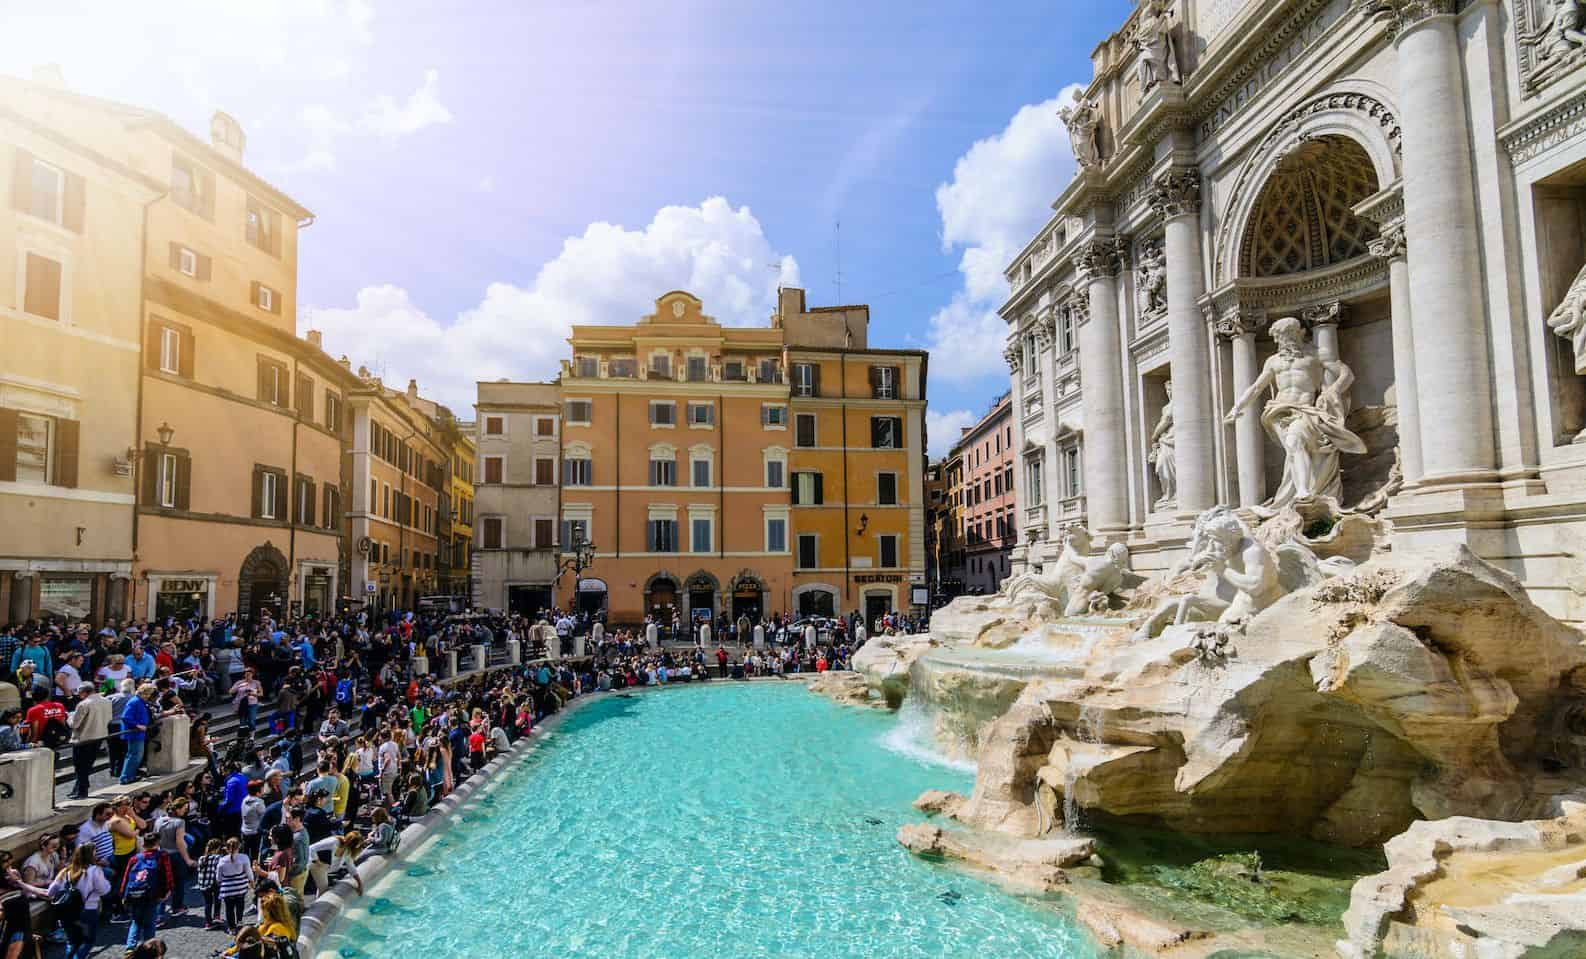 The Trevi Fountain (Italian: Fontana di Trevi)